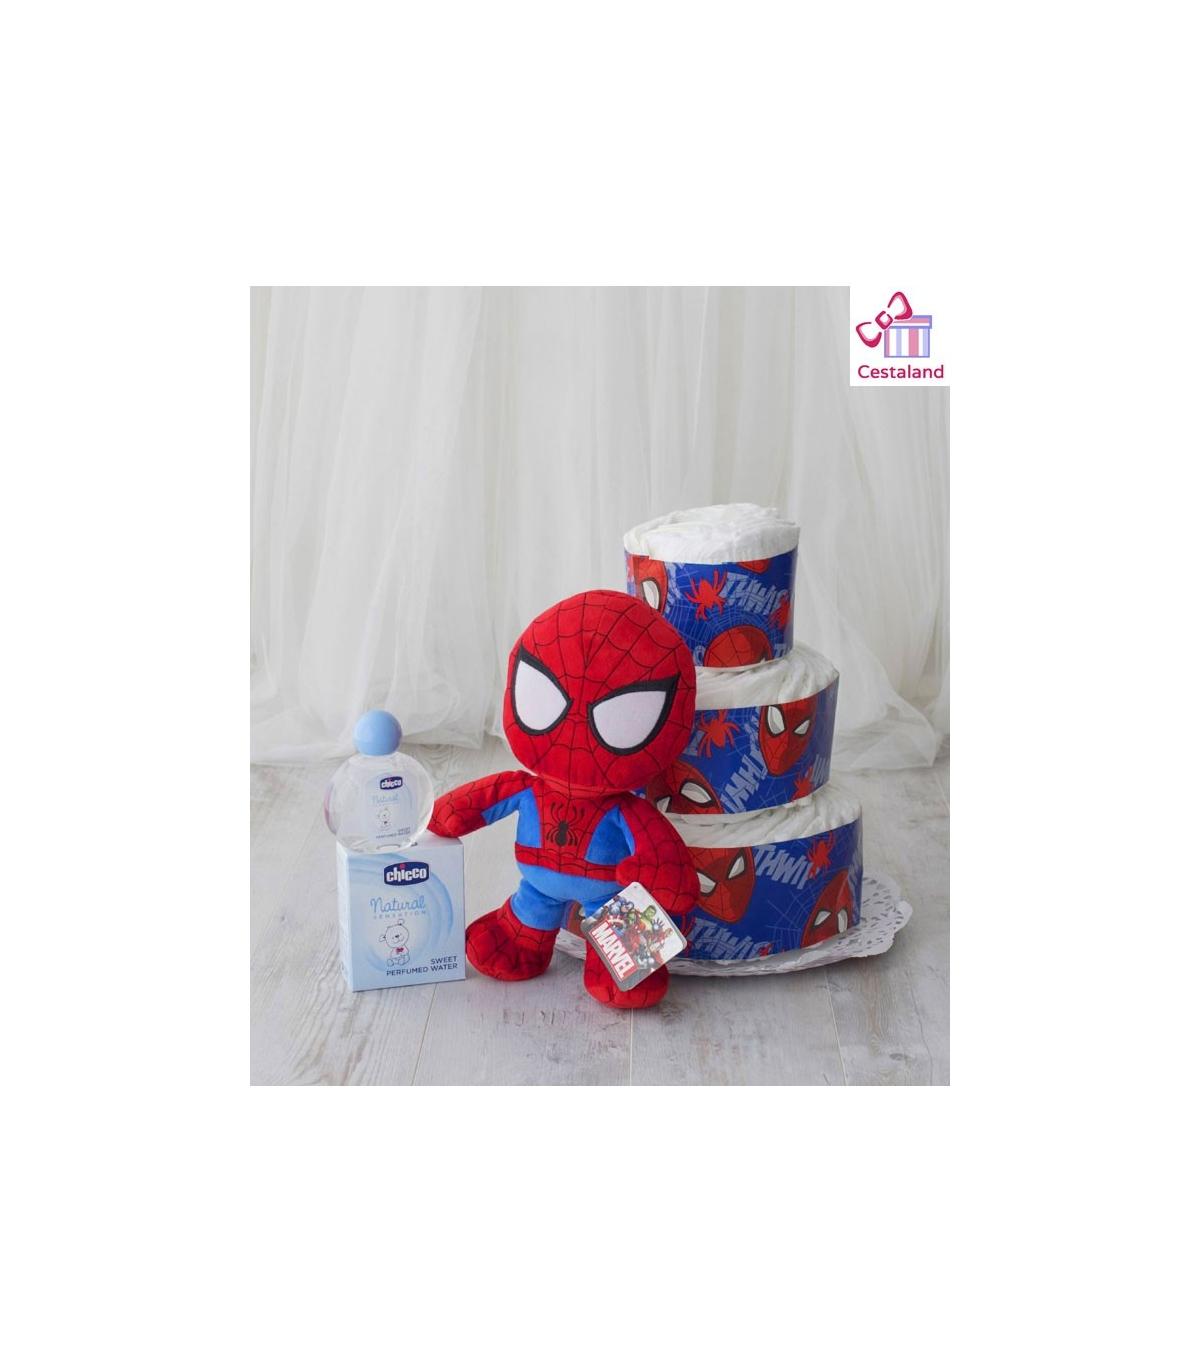 Cosas Frikis Para Bebes.Tarta Panales Spiderman 3 Pisos Regalos Frikis Para Bebes